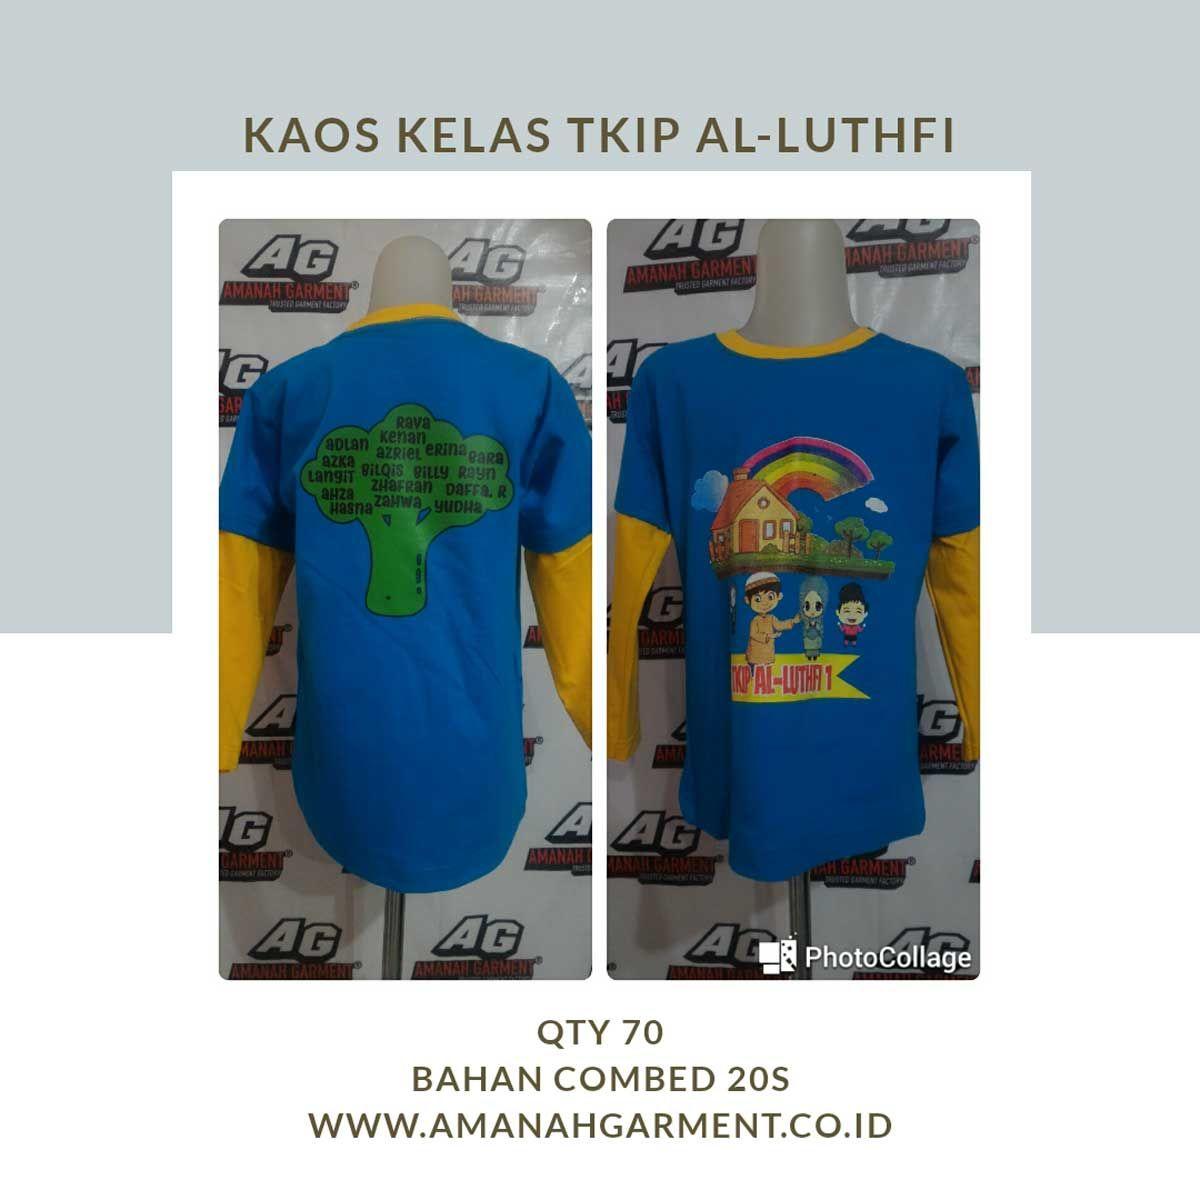 Konveksi Kaos Anak Bandung Dengan Bahan Lembut Baju Anak Kaos Kota Bandung